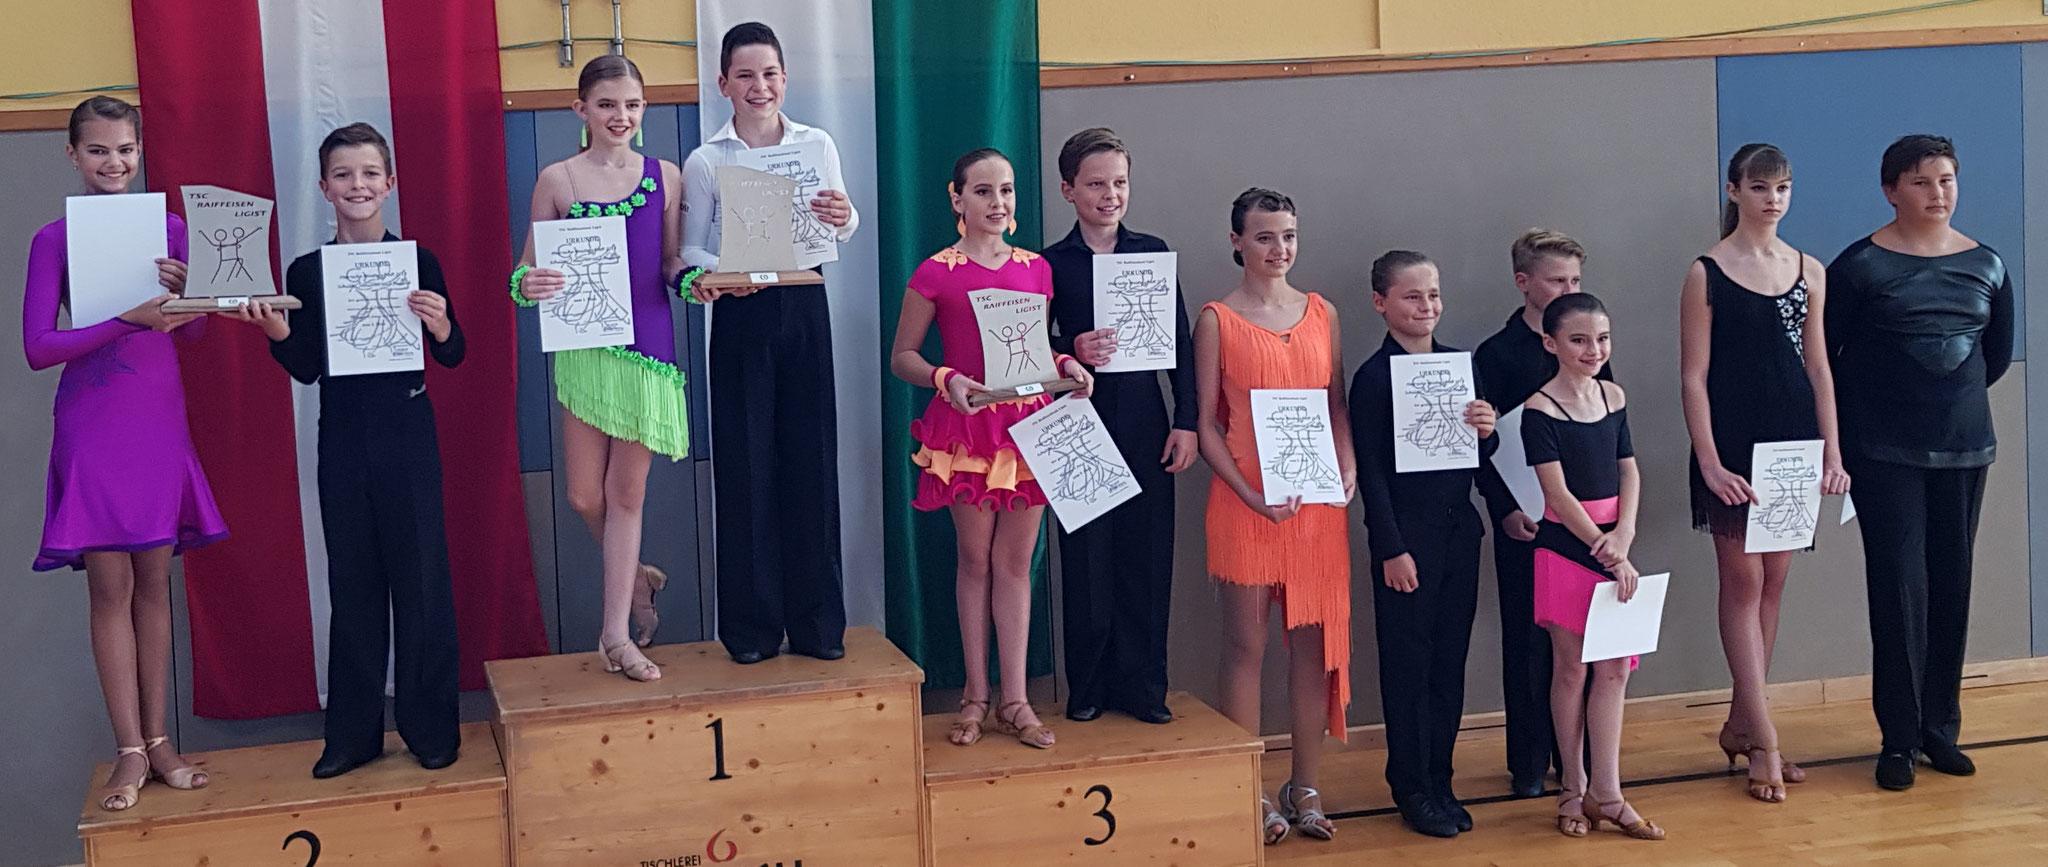 Junioren I Latein D - Steirischer Meister Tim Frei/Emilia Ogris - TSC academy of dance